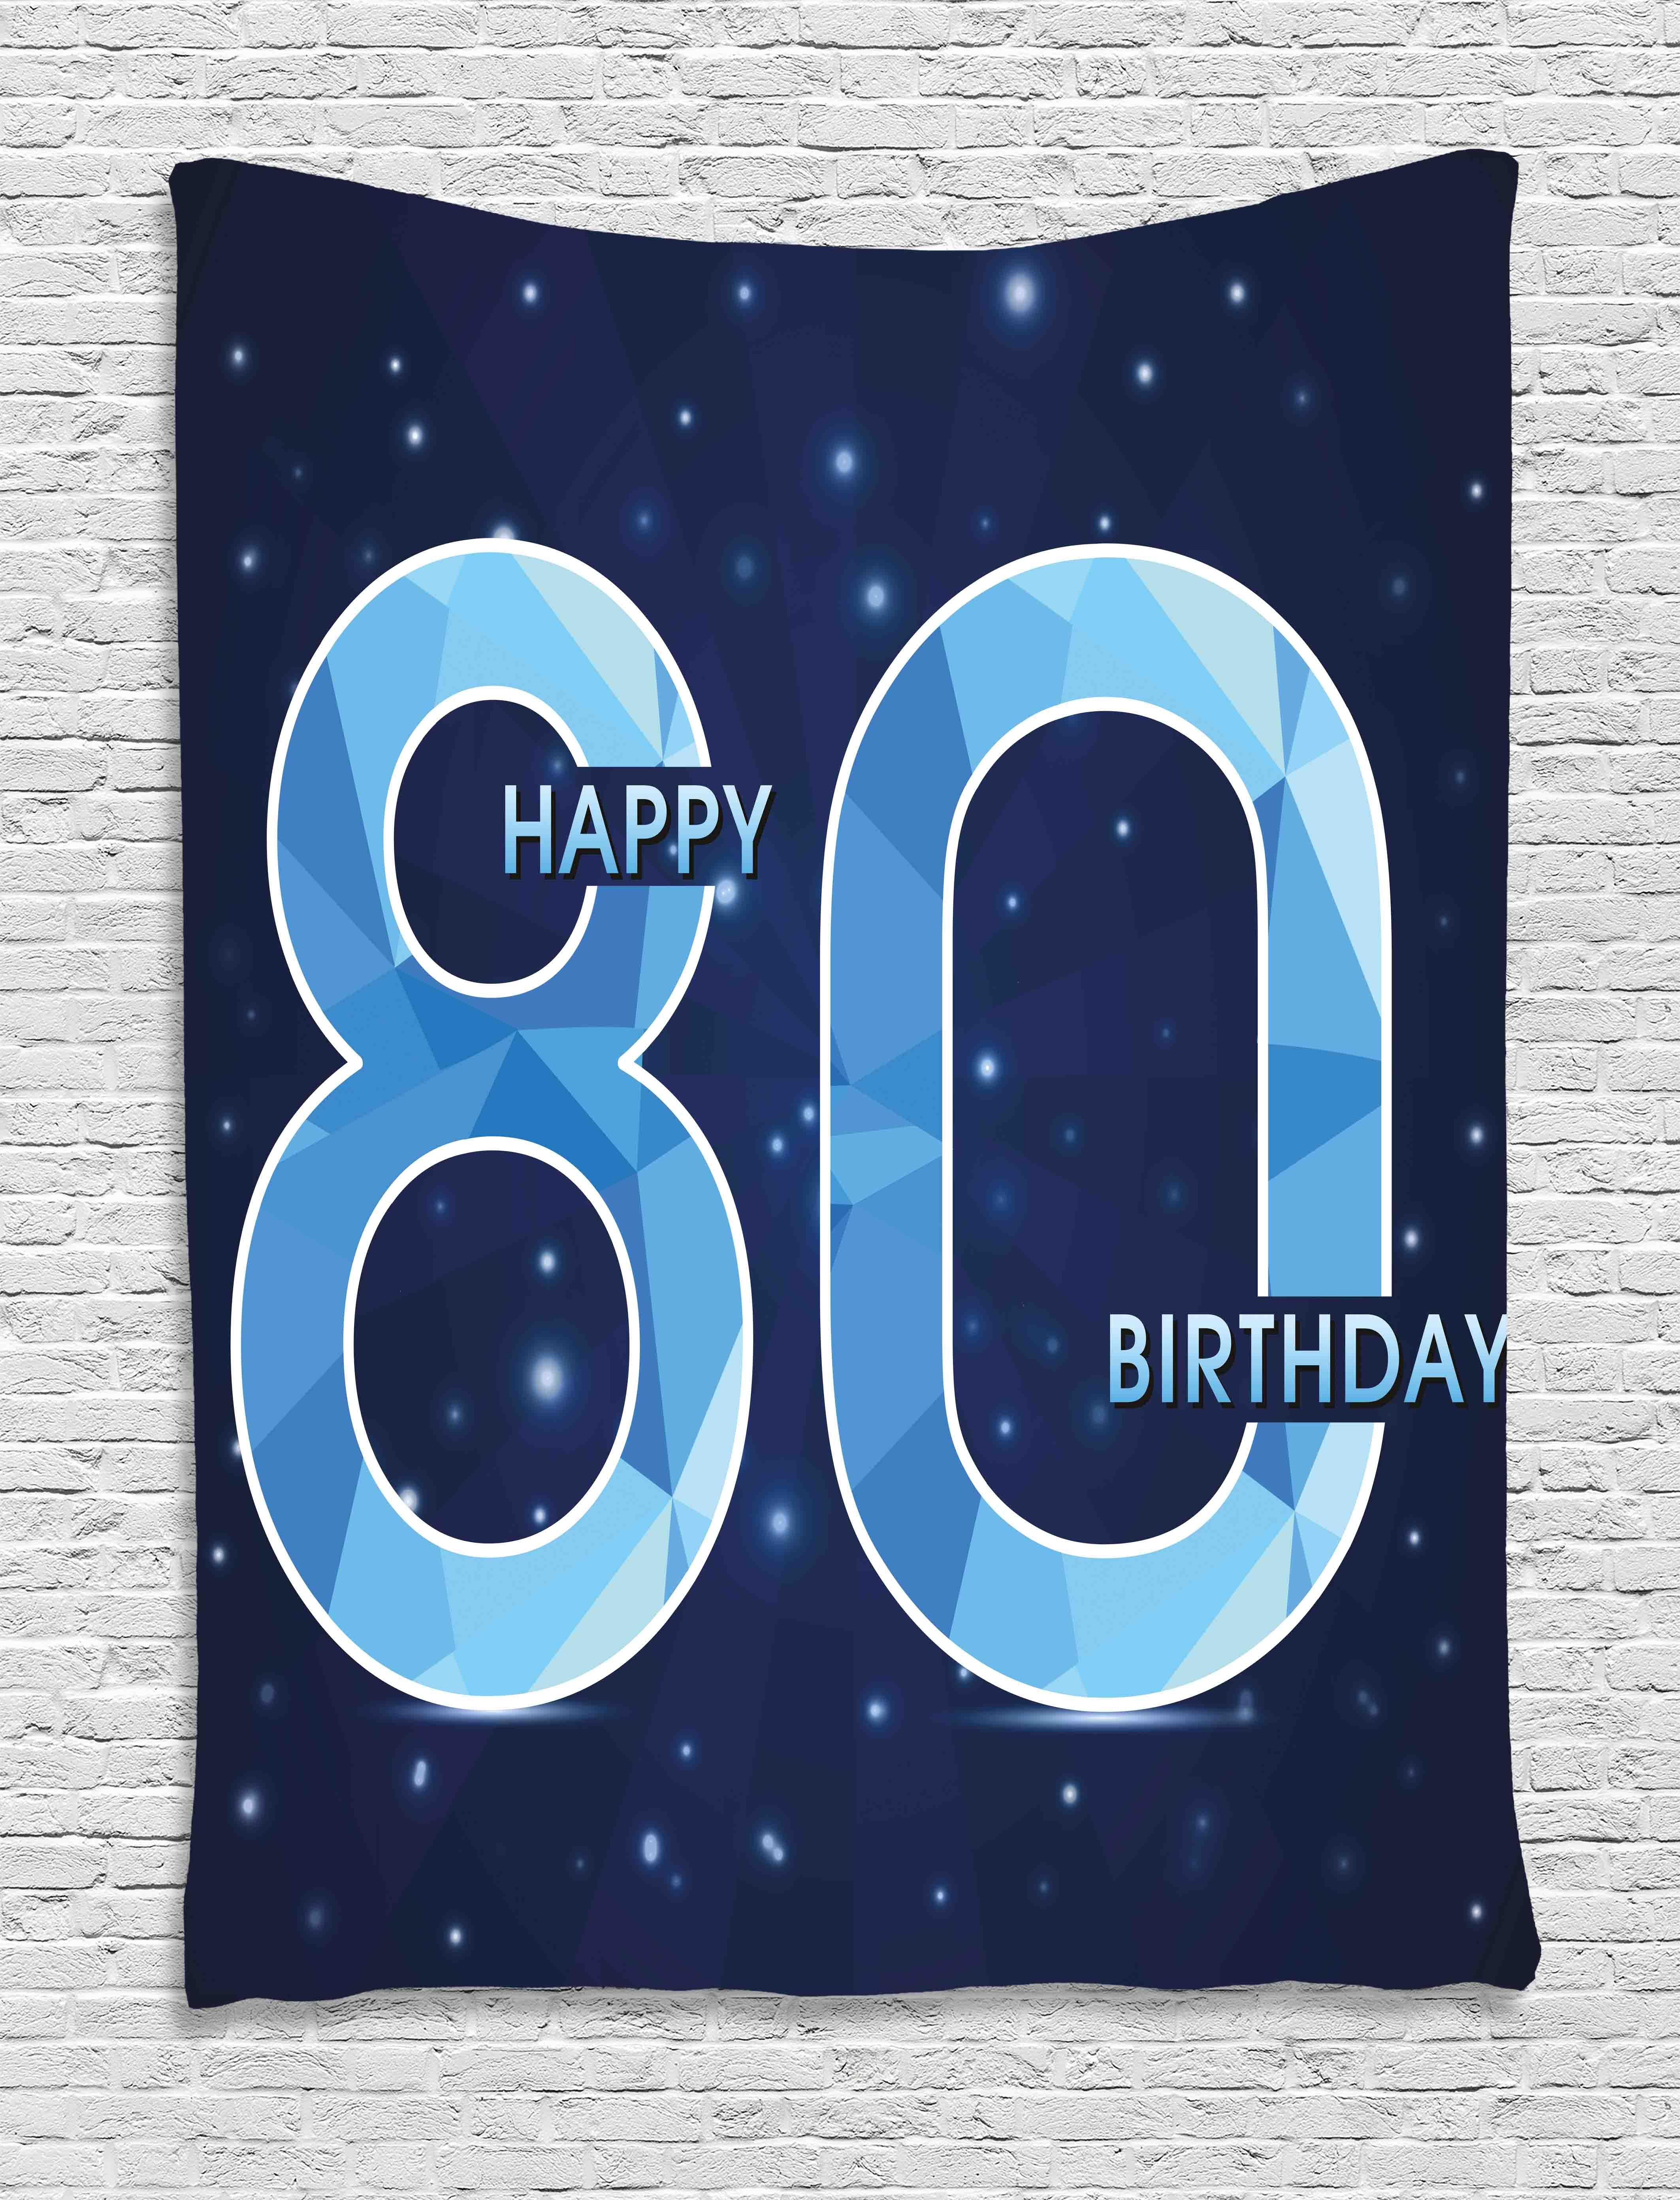 80th Birthday Decorations Tapestry Diamond Age 80 Happy Birthday